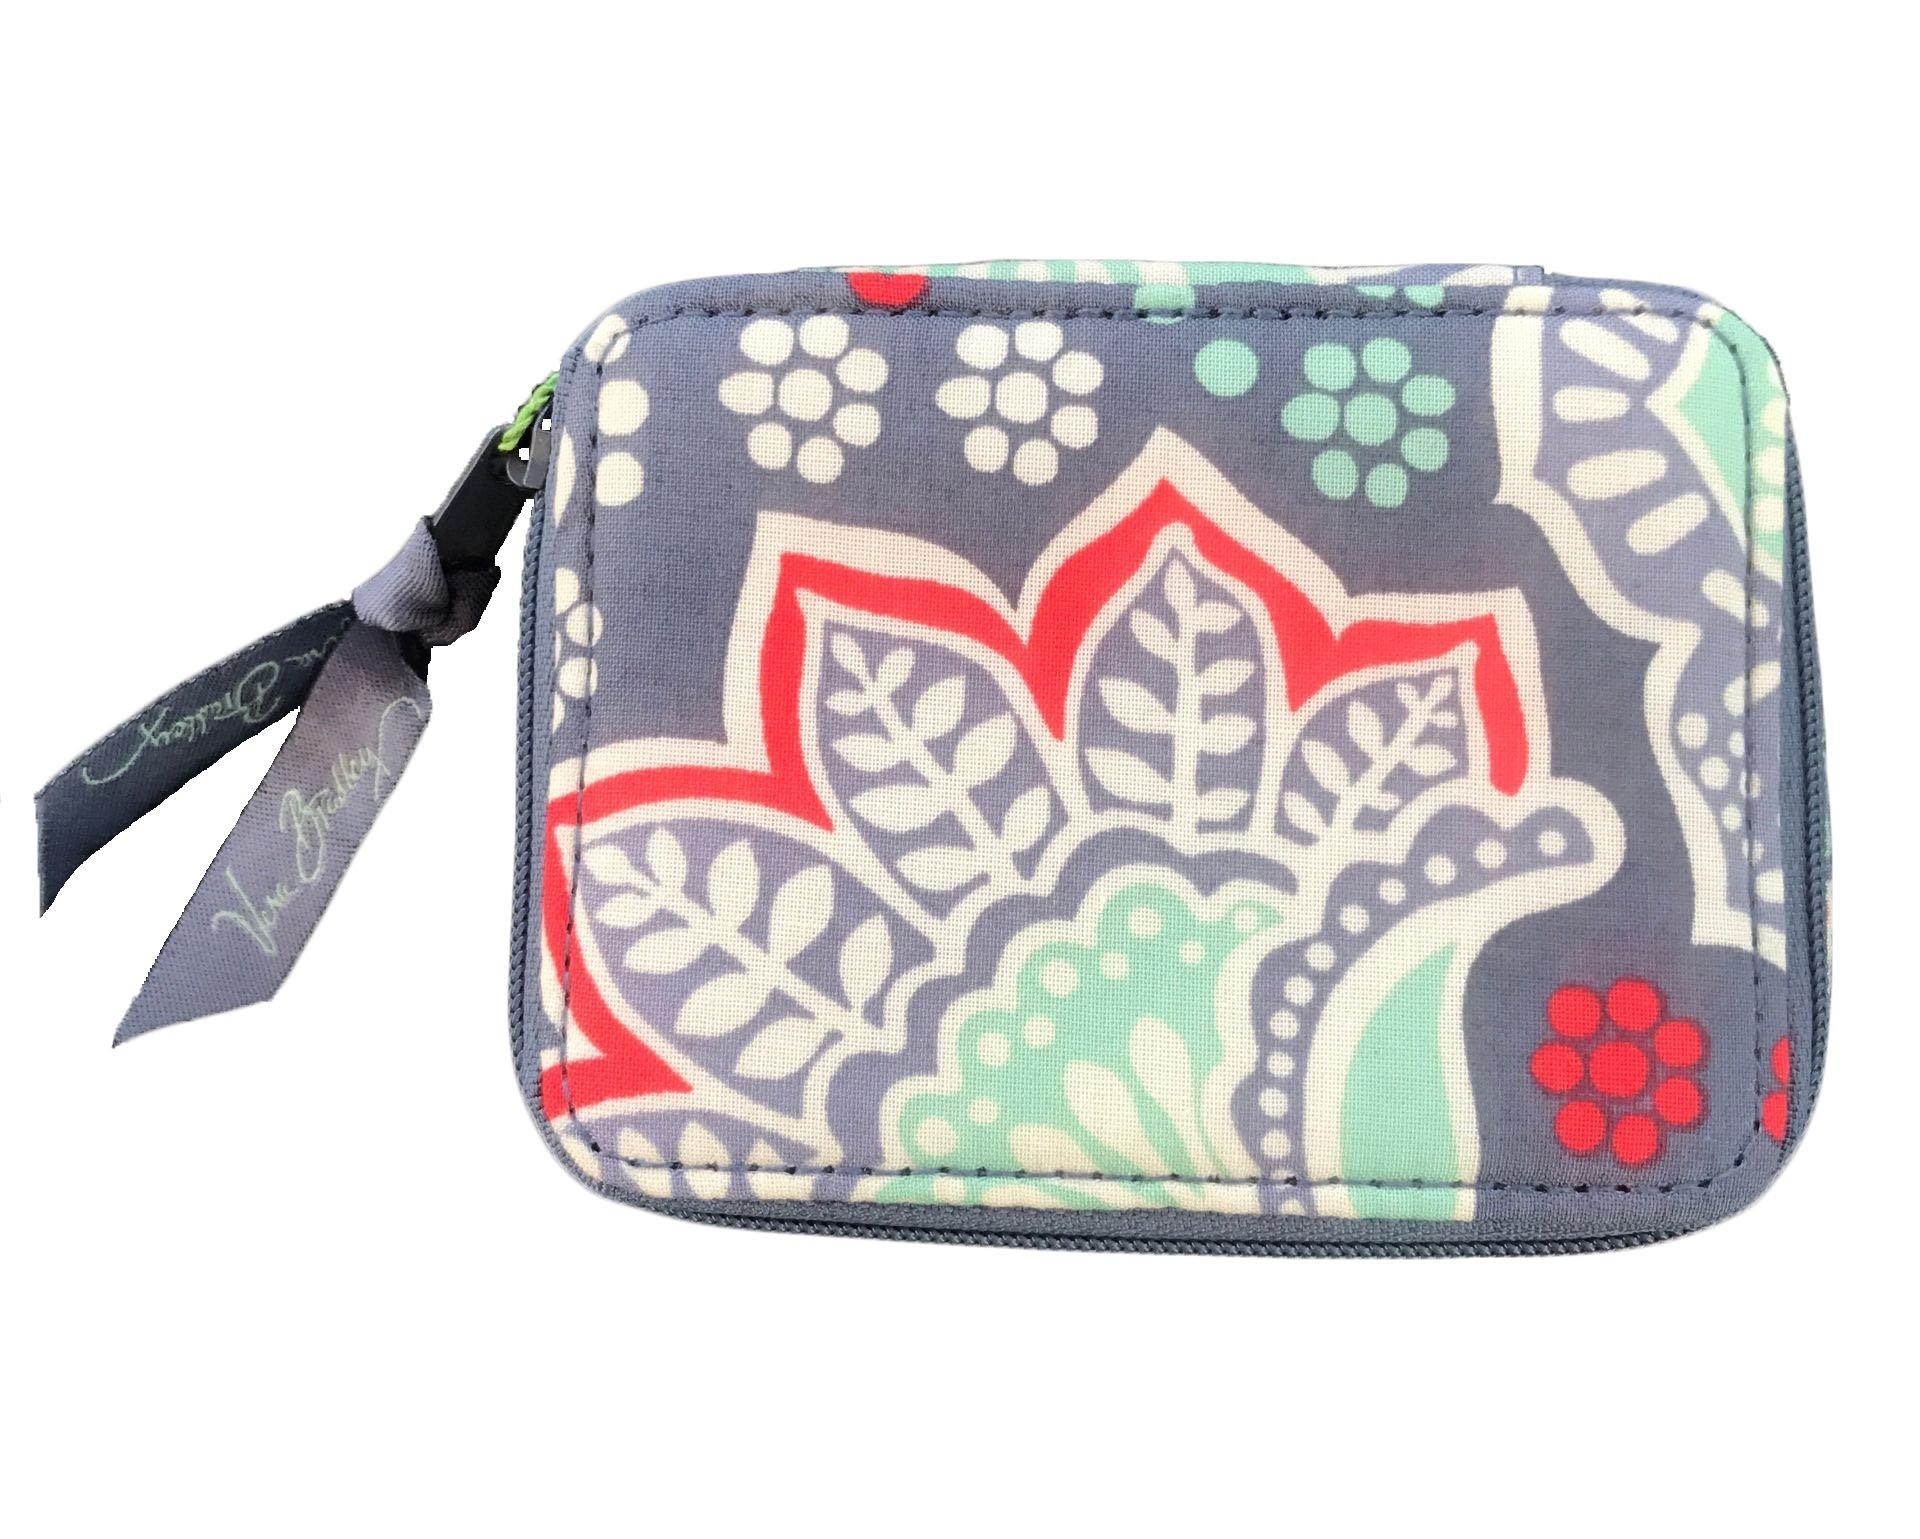 Vera Bradley Travel Pill Case in Nomadic Floral Solid Grey Lining